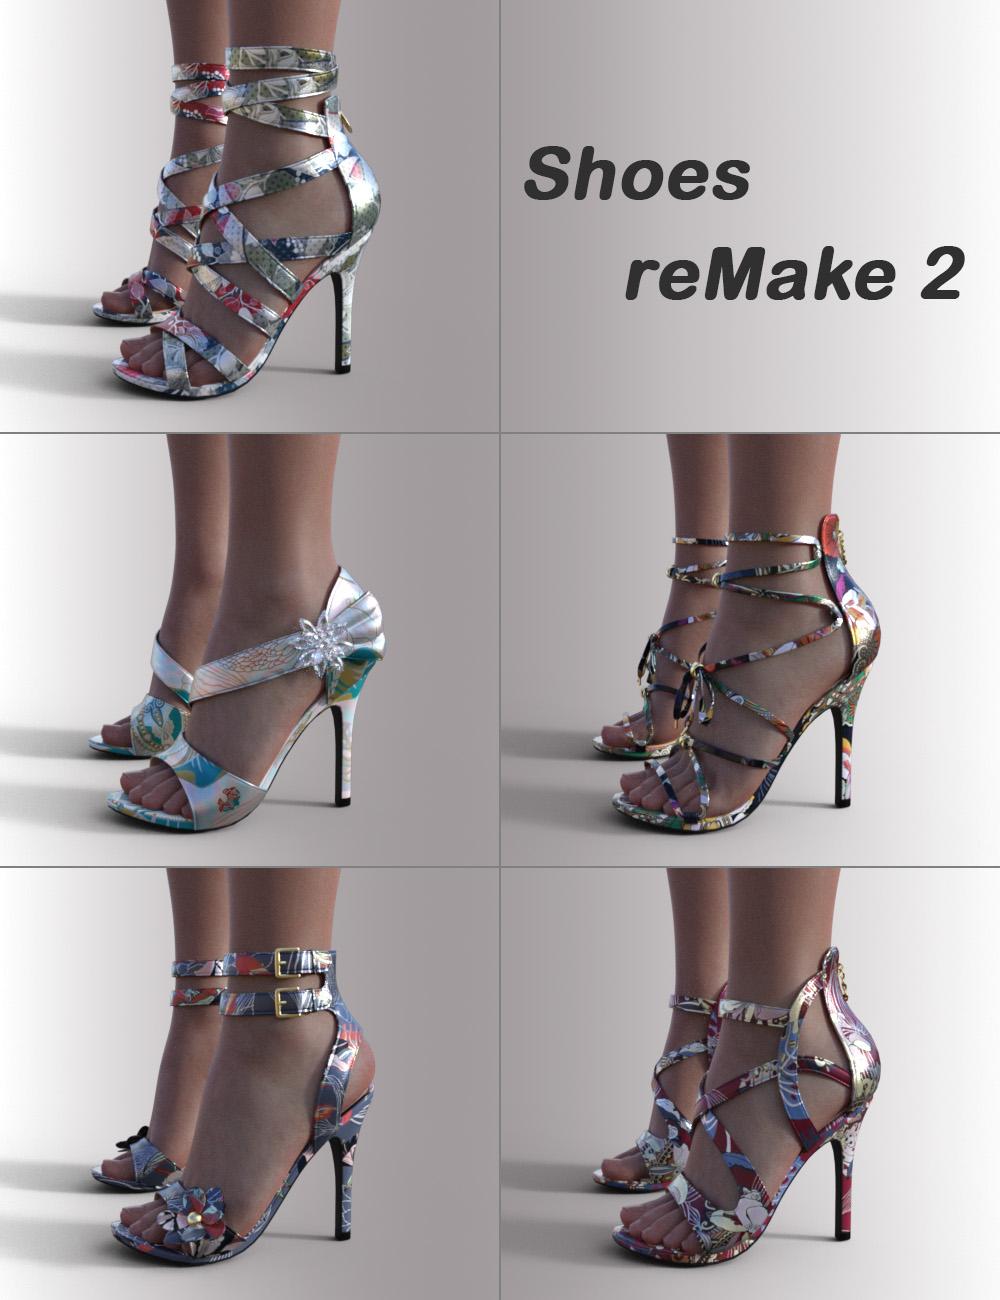 Shoes ReMake 2 for Genesis 8.1 Females by: OnnelArryn, 3D Models by Daz 3D